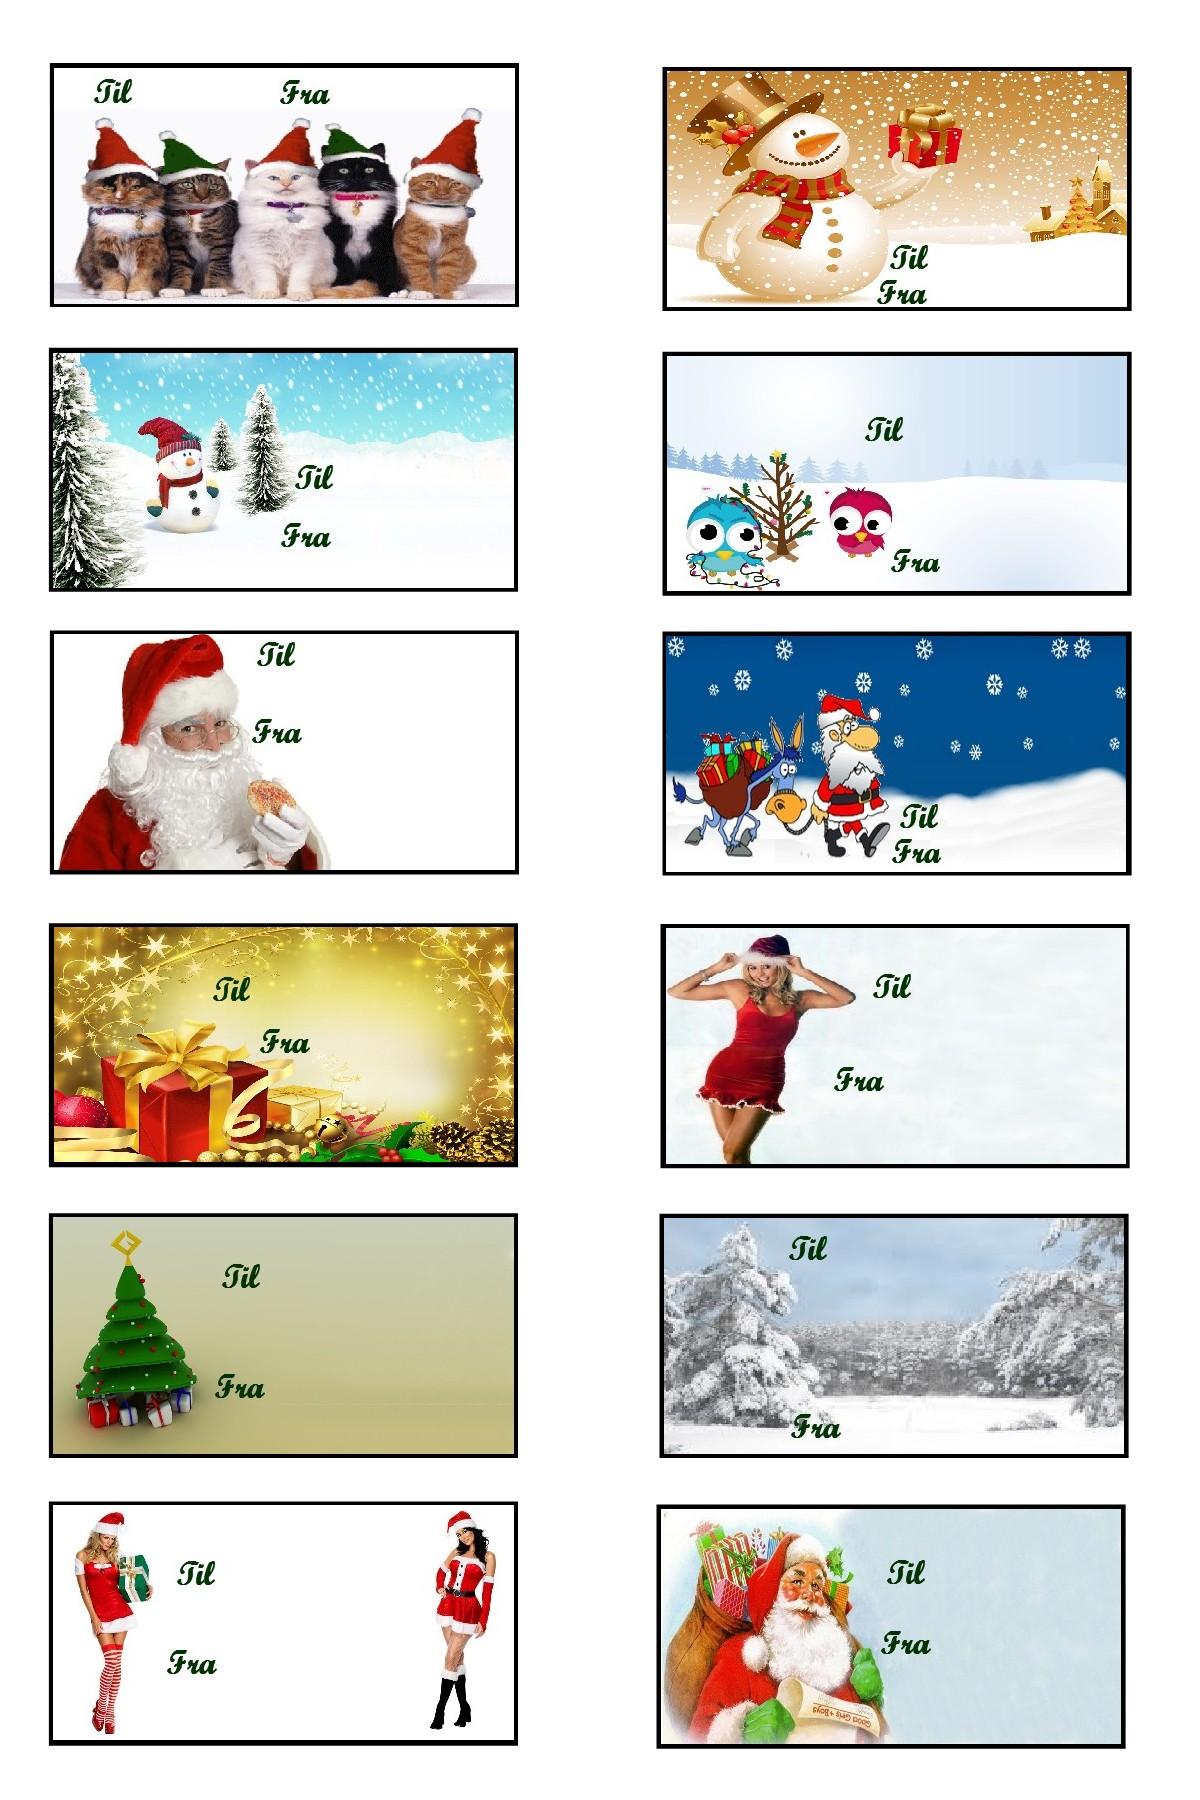 julegavekort